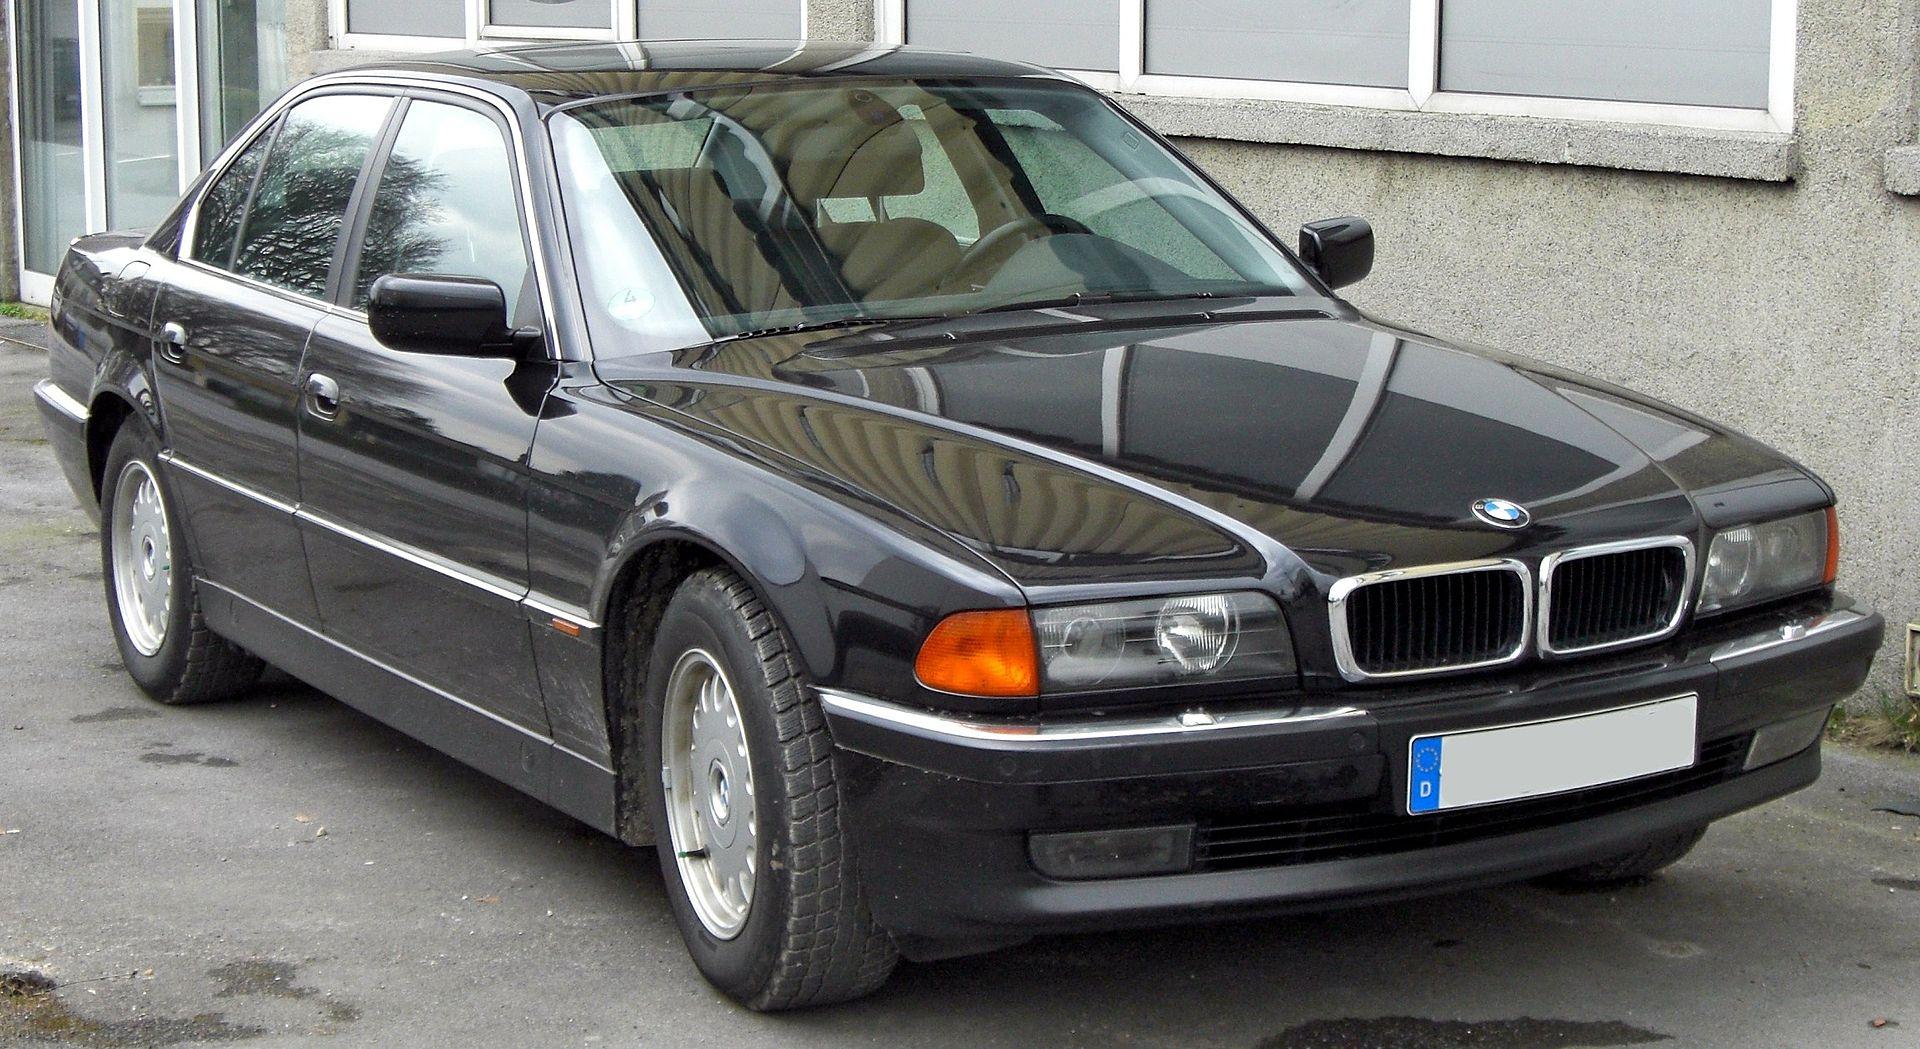 1920px-BMW_7er_%28E38%29_20090314_front.